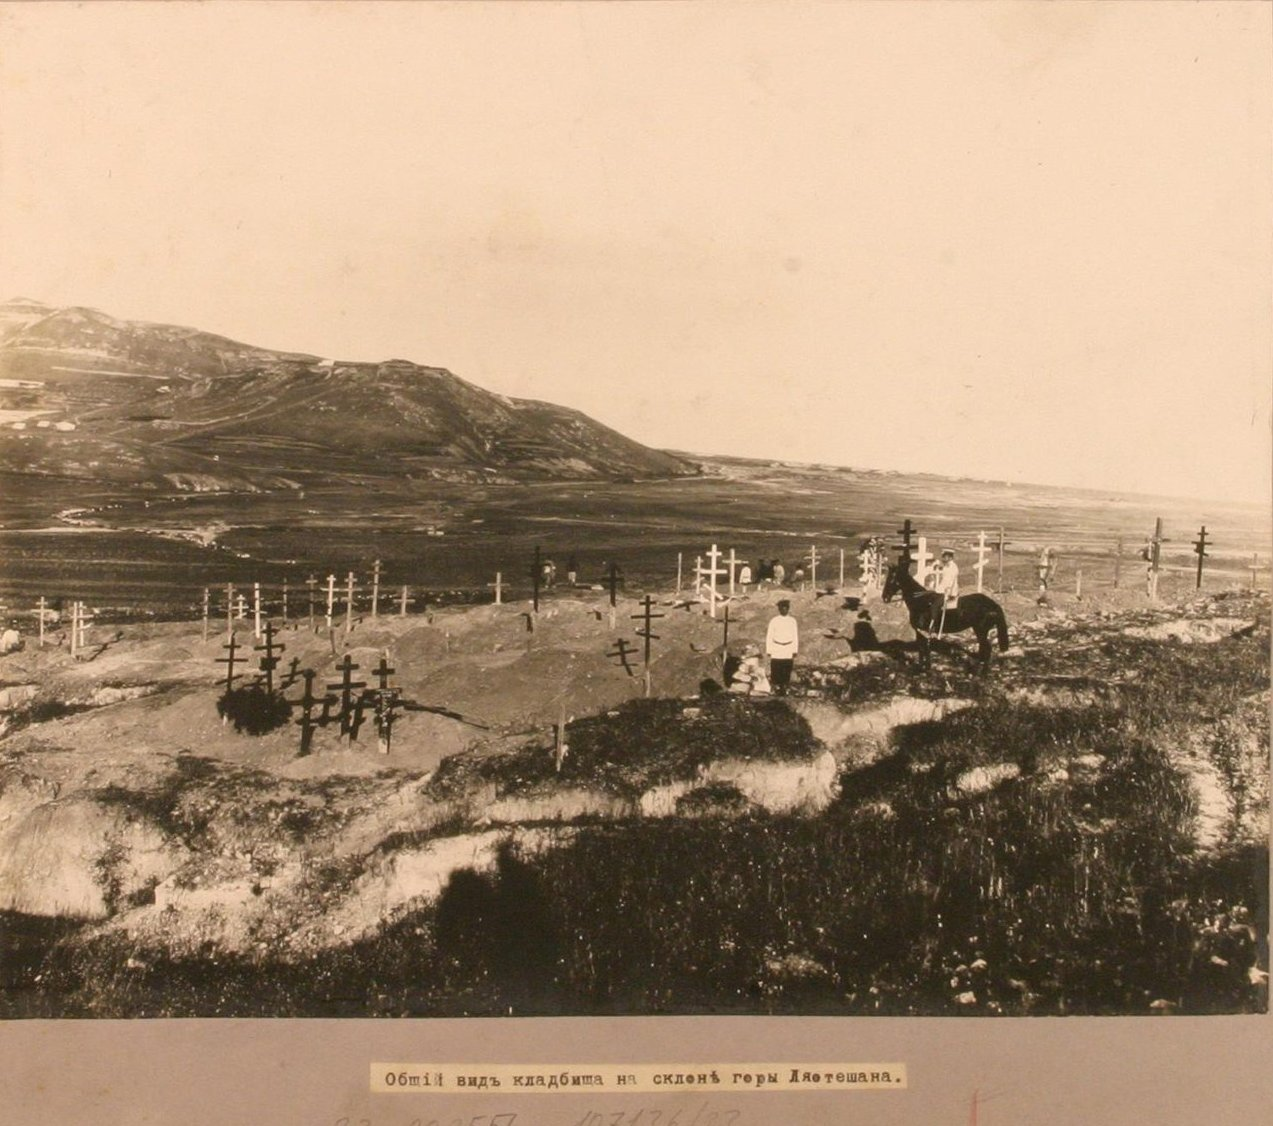 03. Кладбище на склоне горы Ляотешана